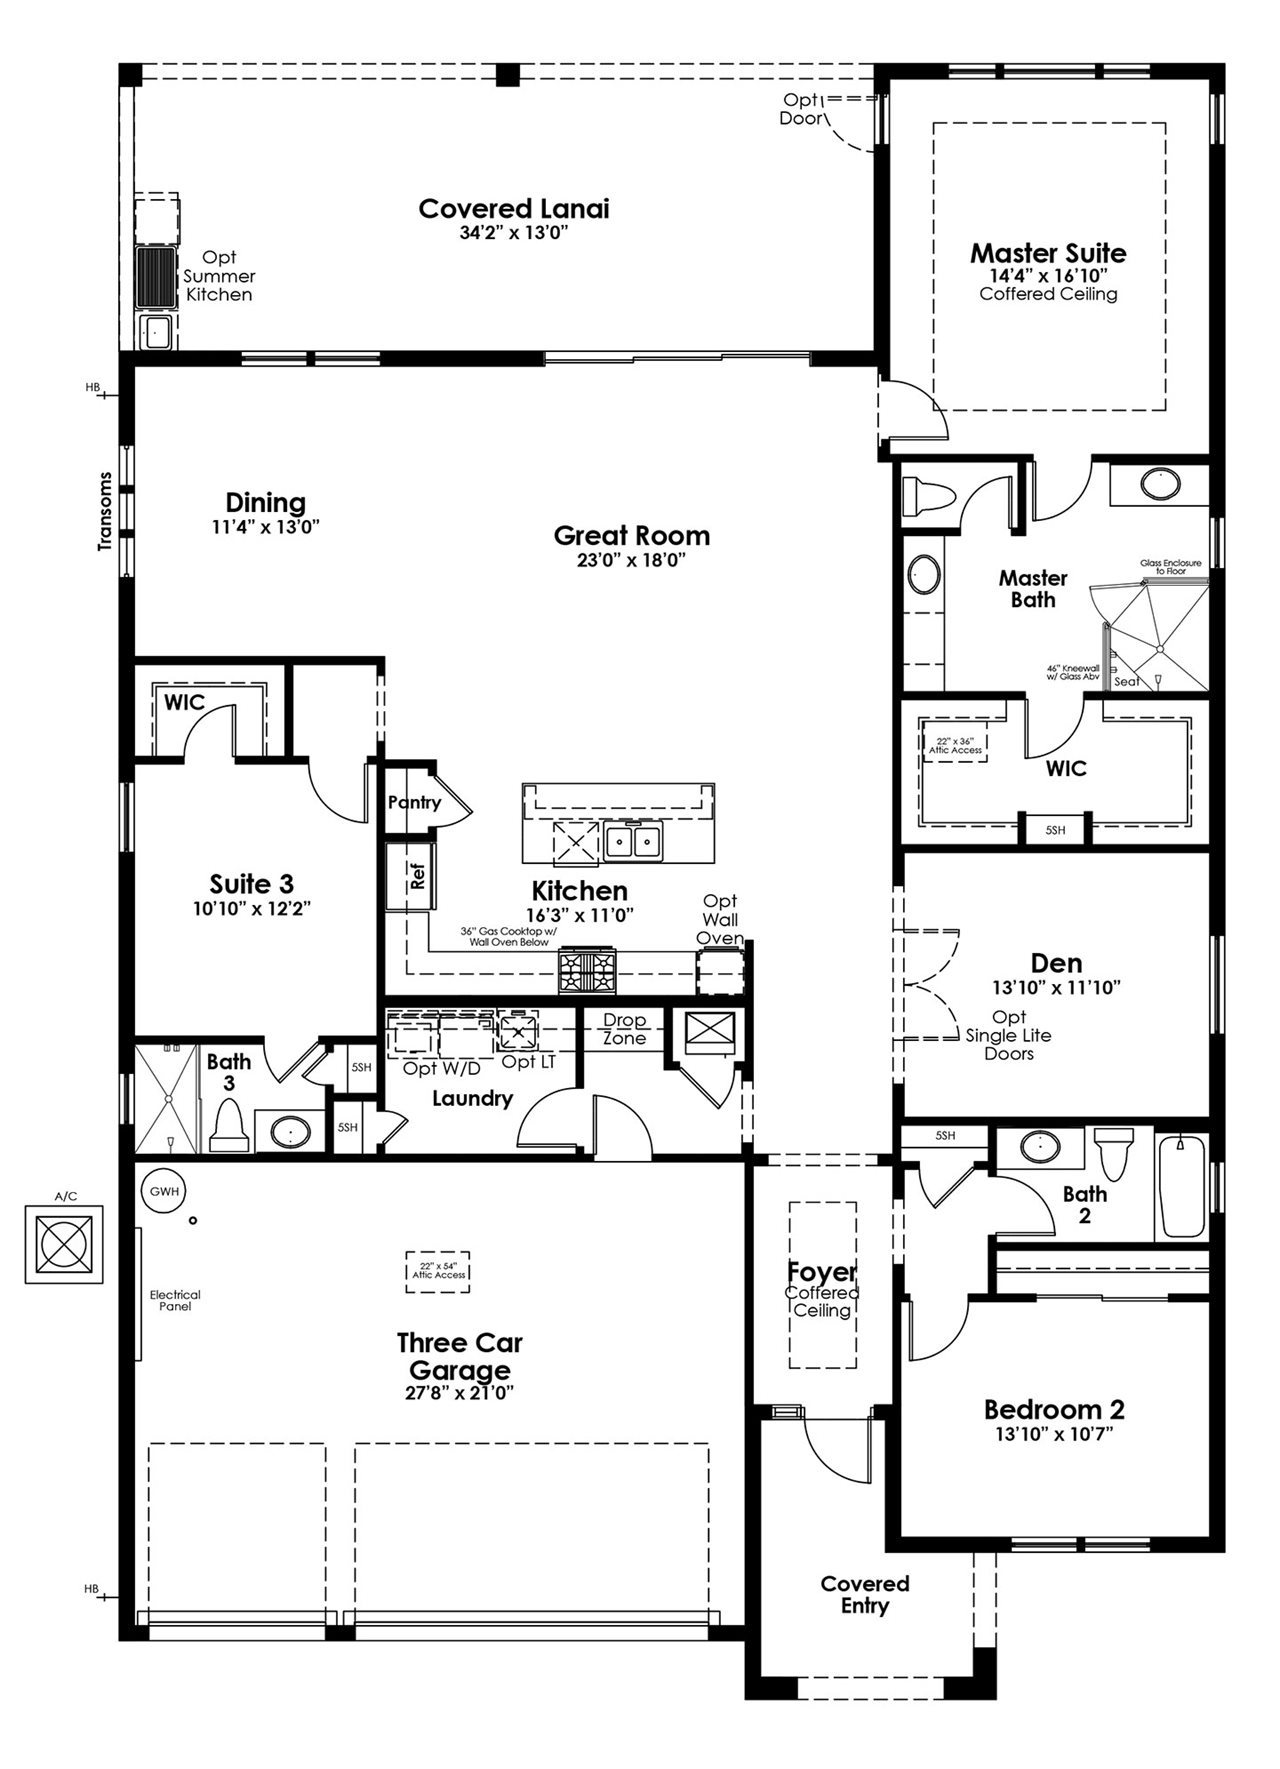 Davinci Plan At Artistry Sarasota In Sarasota Fl By Kolter Homes